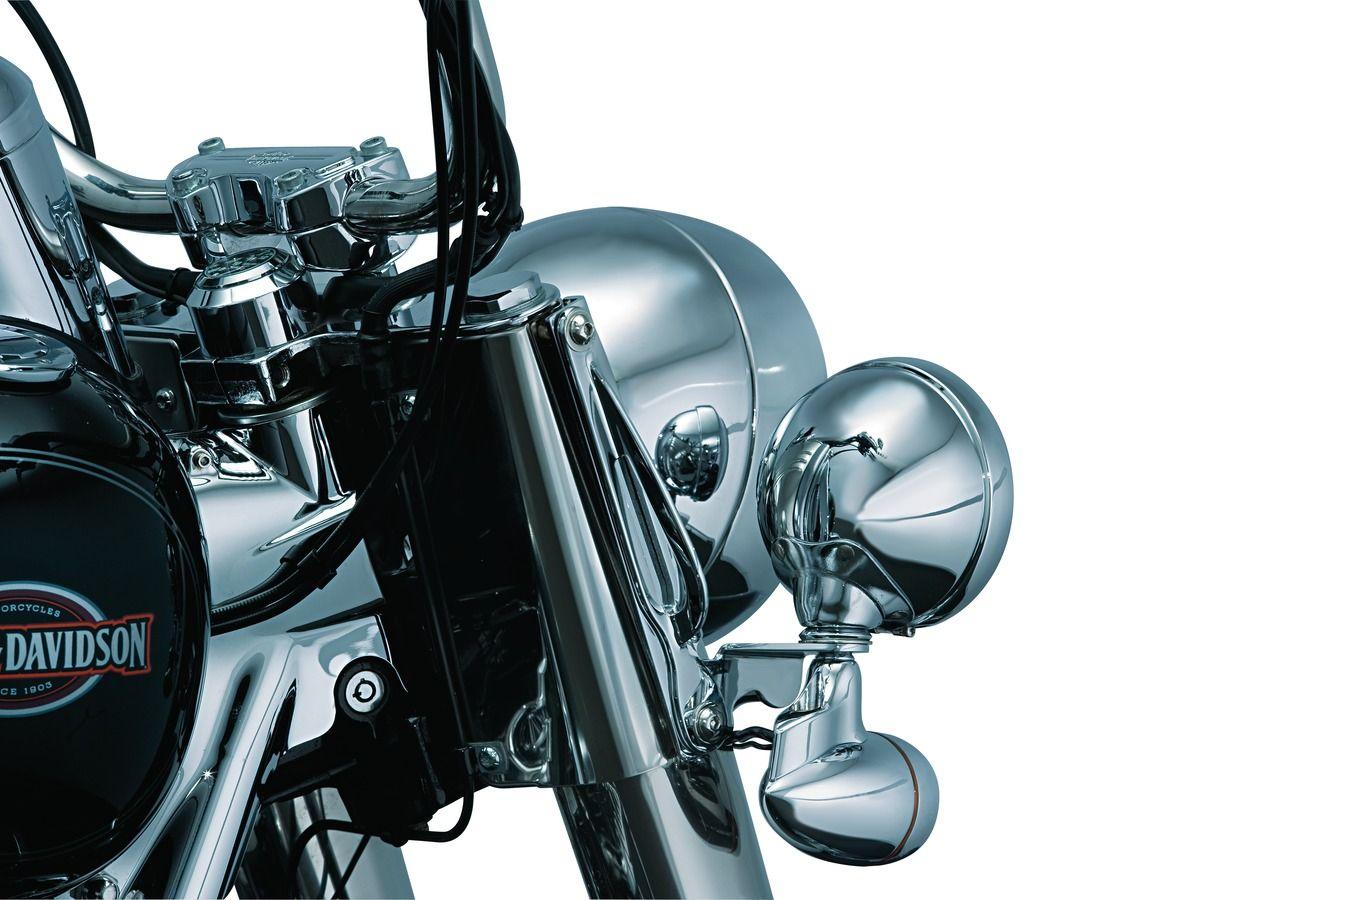 86-16 Kuryakyn Chrome Teardrop Tie-Downs for Harley FL Softail Models pr